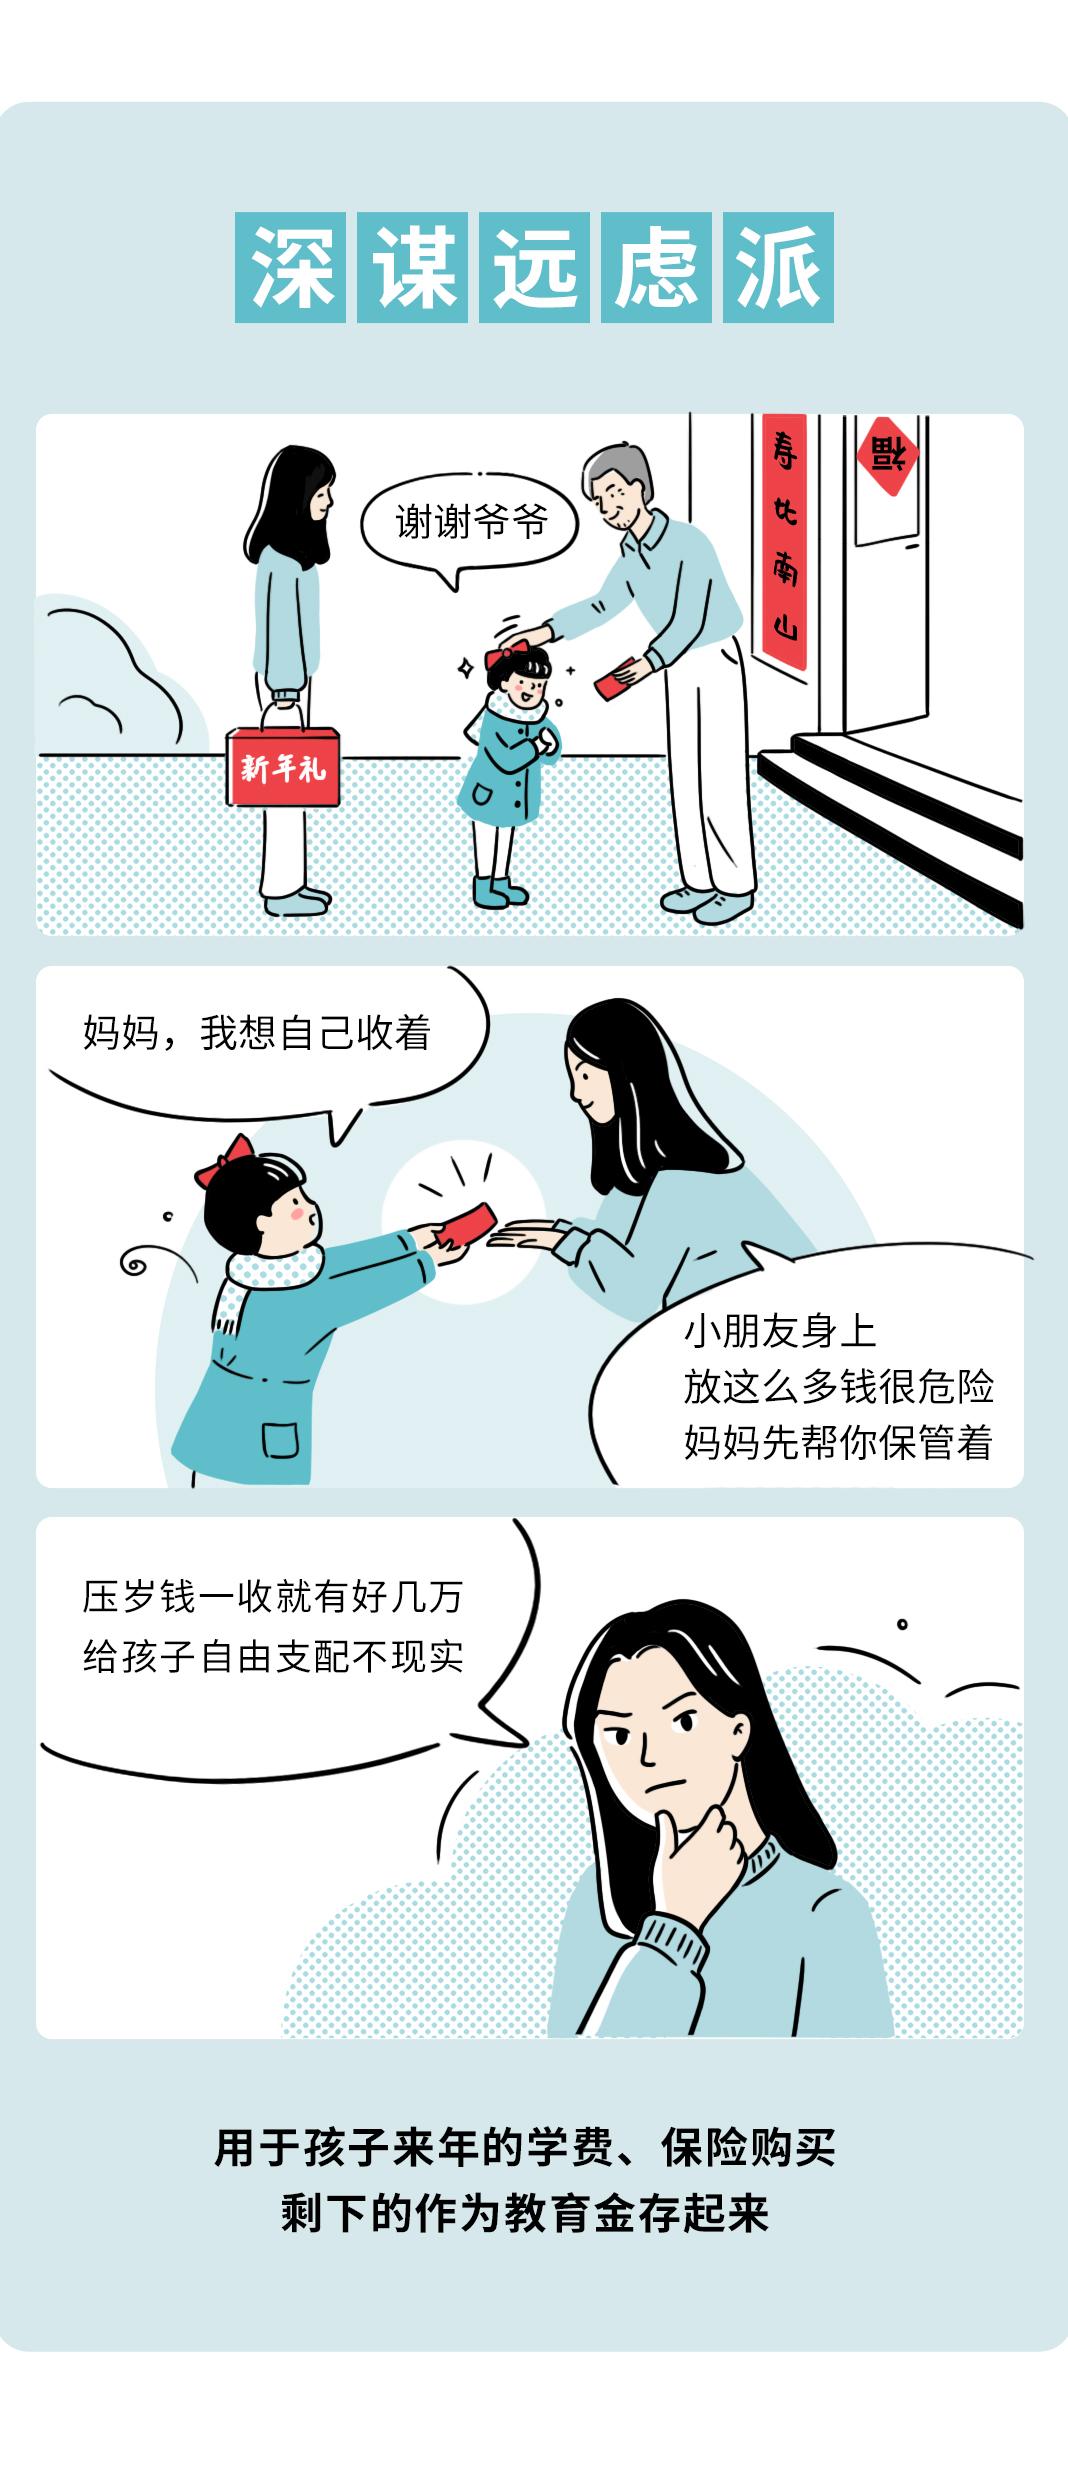 https://level8cases.oss-cn-hangzhou.aliyuncs.com/GMT微信202126_02-fd756263-5b33-4e68-964a-4e8eaac00e92.jpg